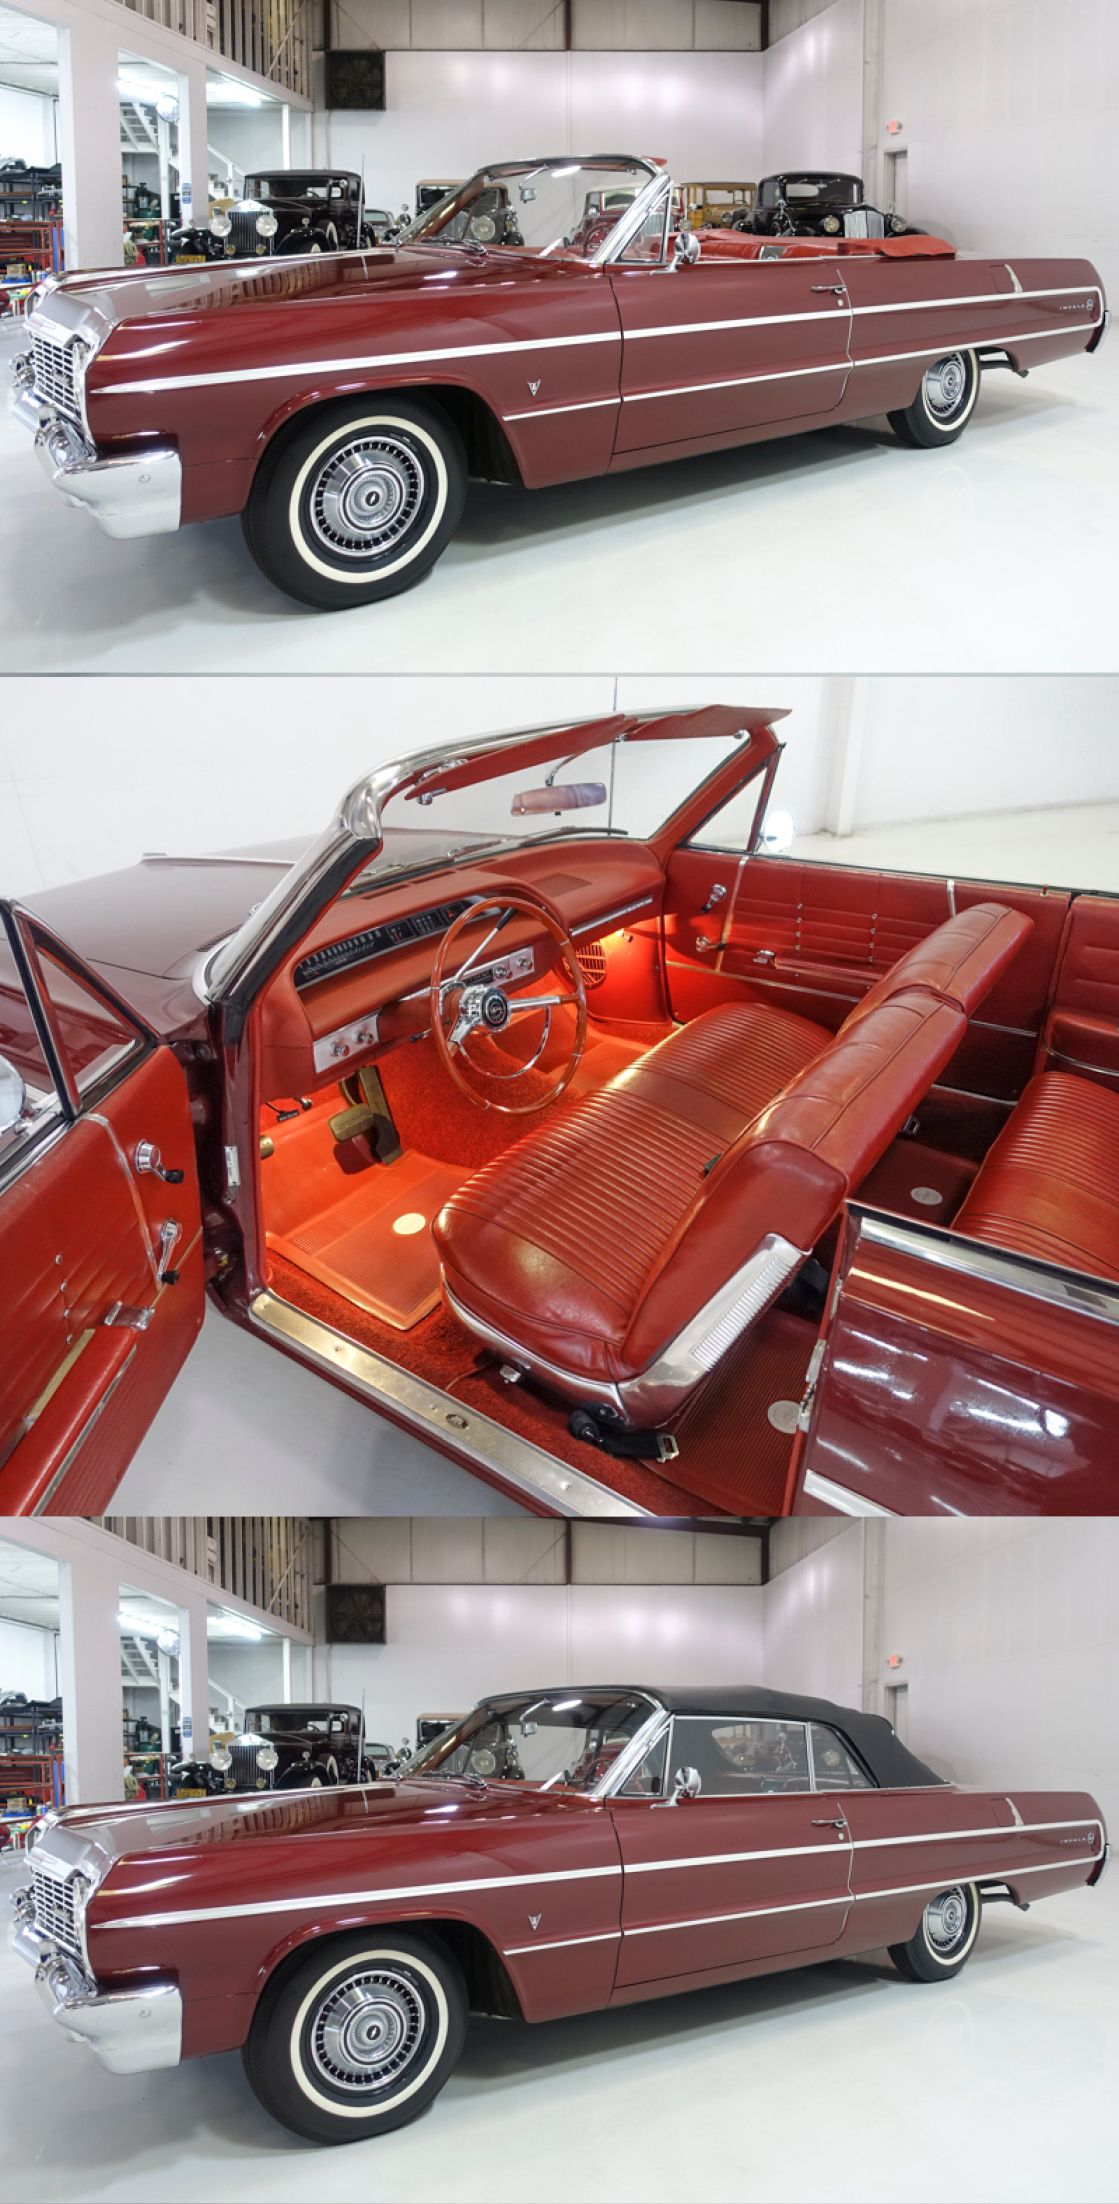 1964 Chevrolet Impala Convertible Convertible For Sale In 2020 Chevrolet Impala Chevrolet Impala